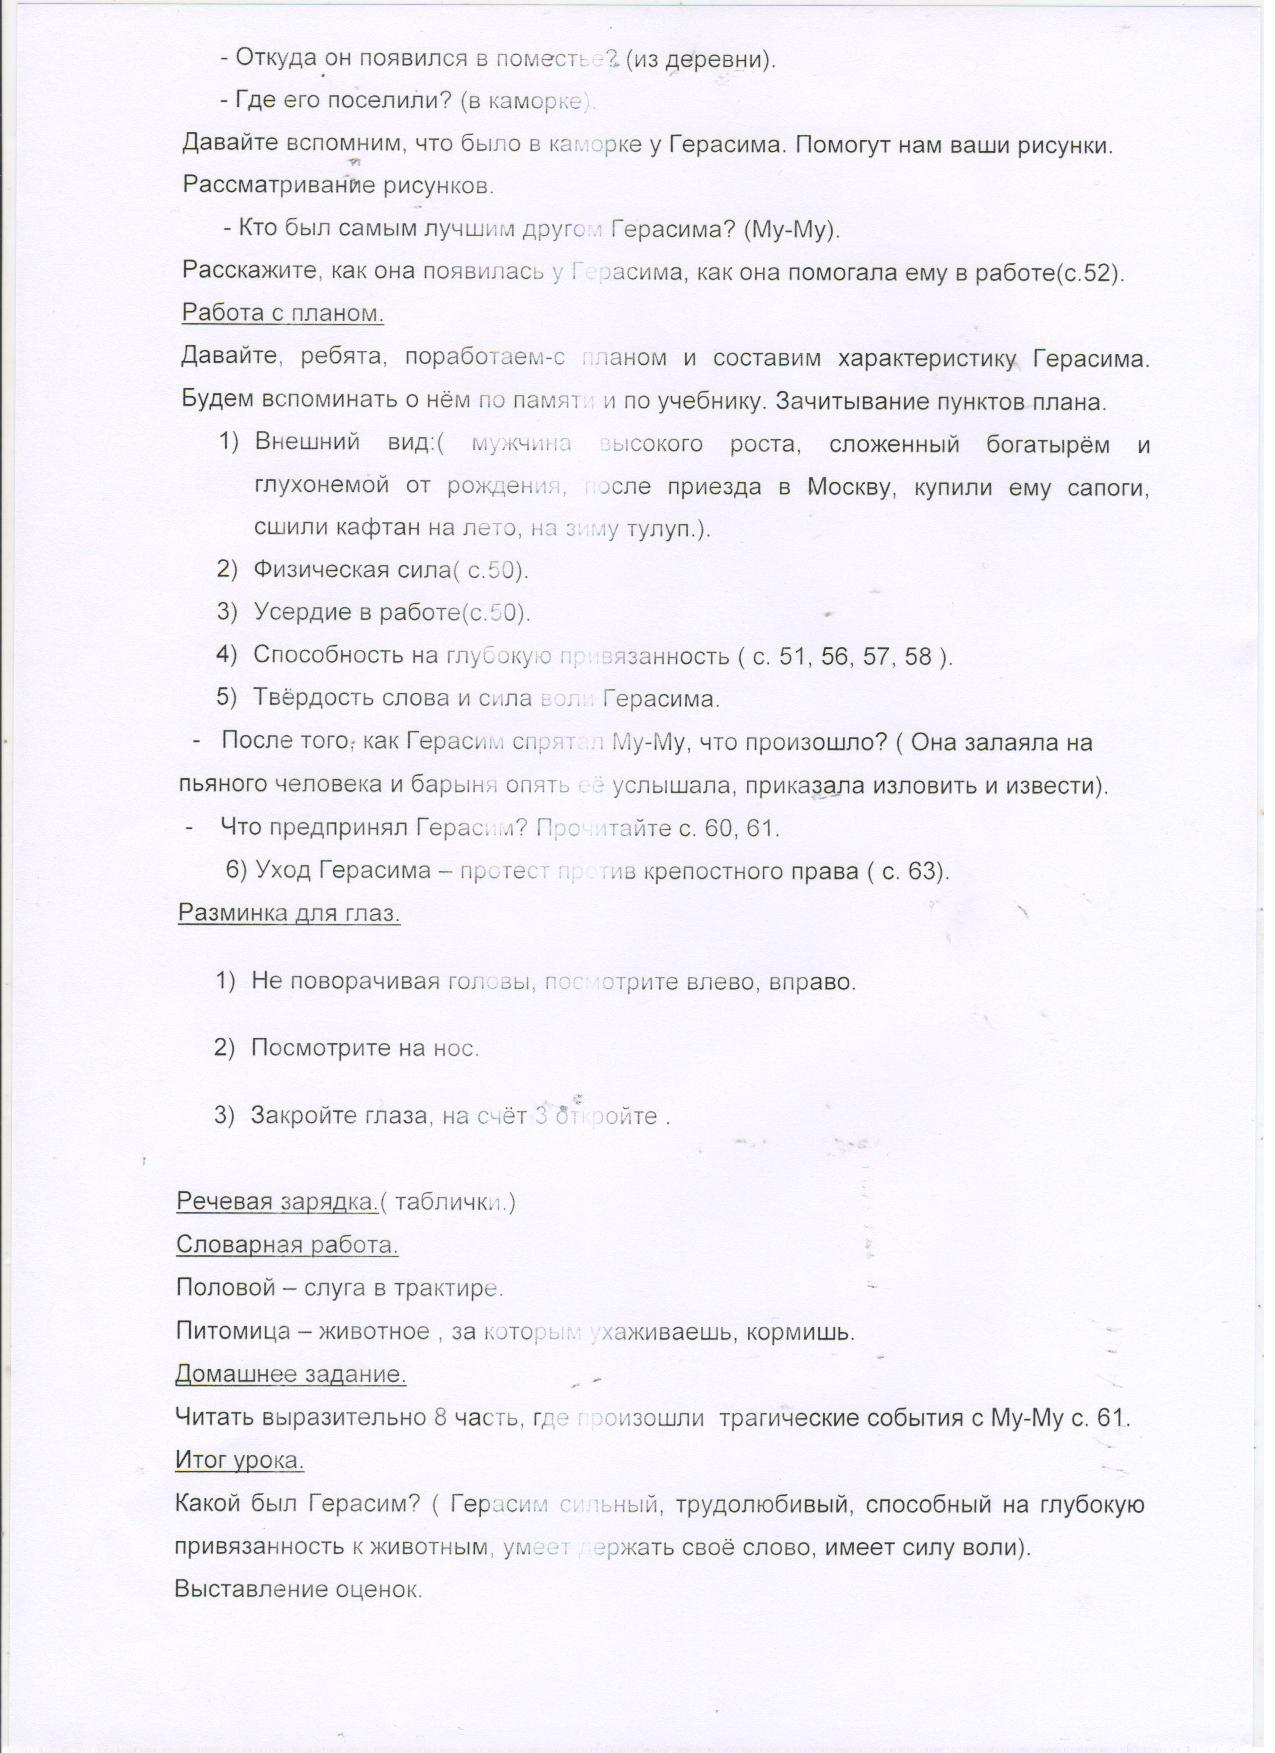 C:\Documents and Settings\Администратор\Рабочий стол\Тептякова Е.А. 017.jpg